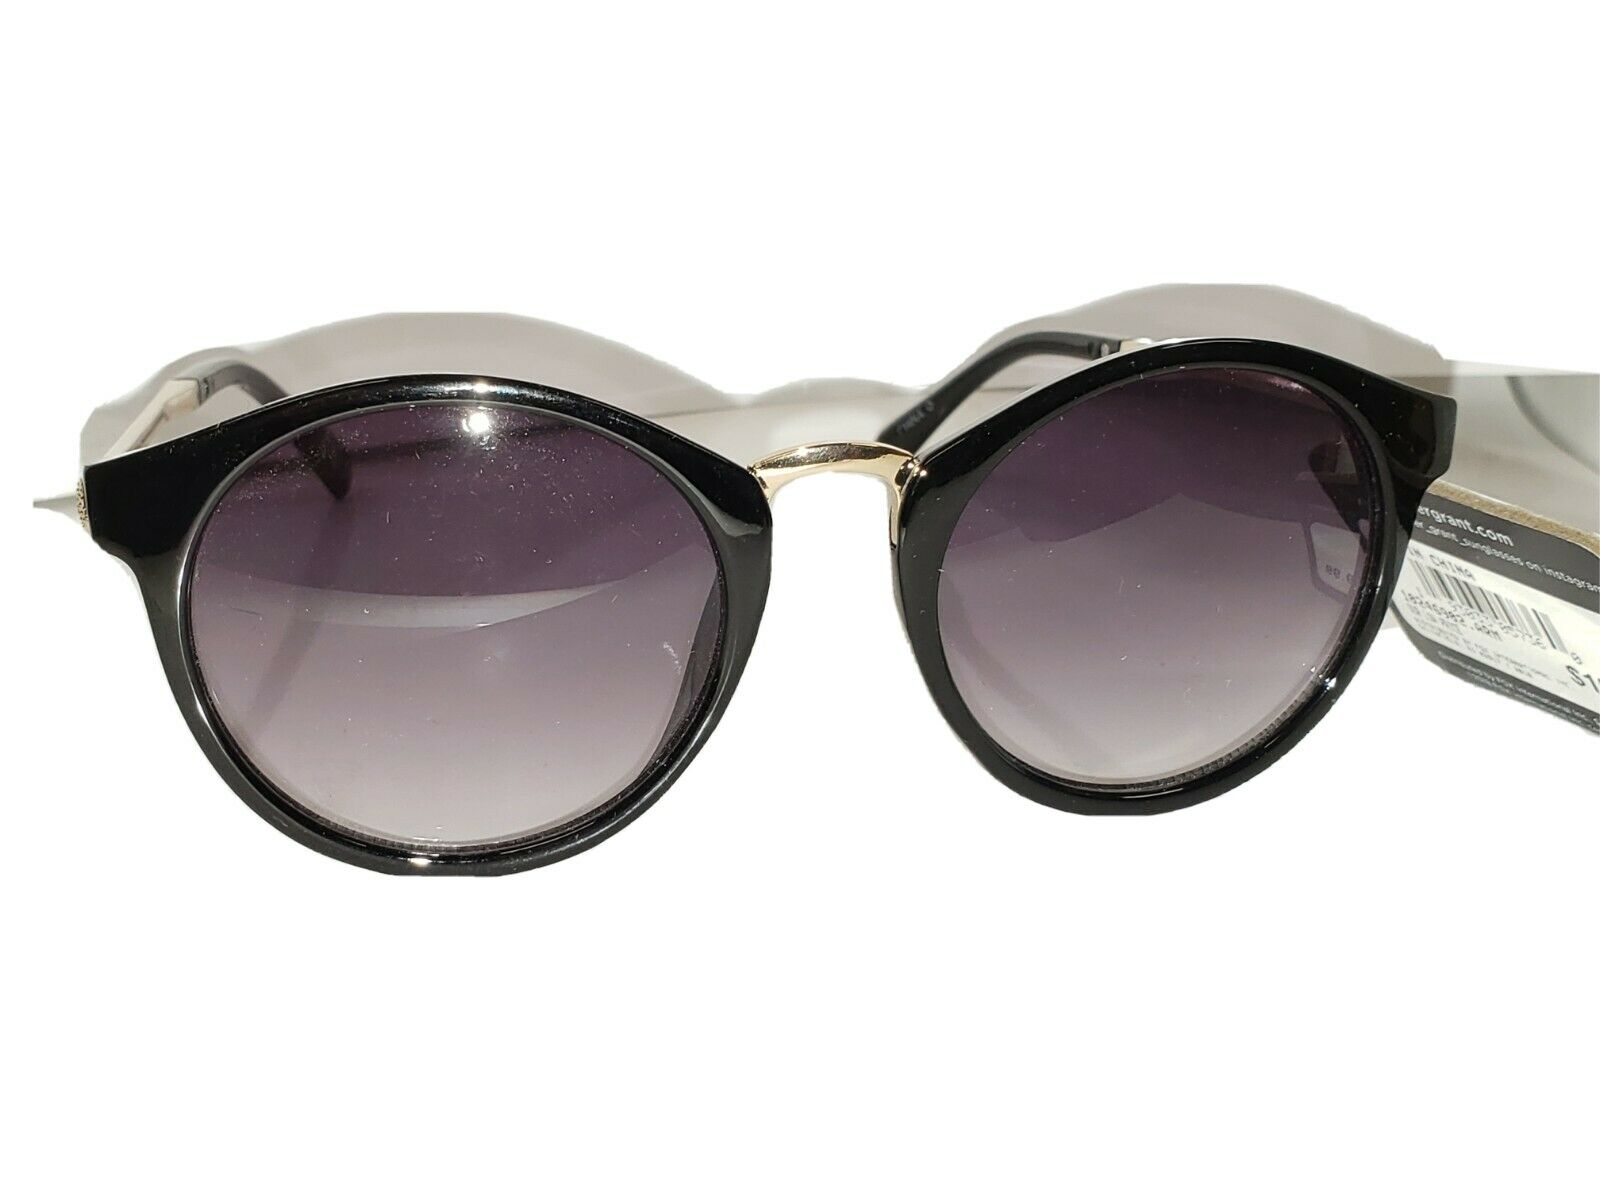 Foster Grant Sunglasses JS 18 01 MCV Black w Brass fashion stems Retro Cat Eye